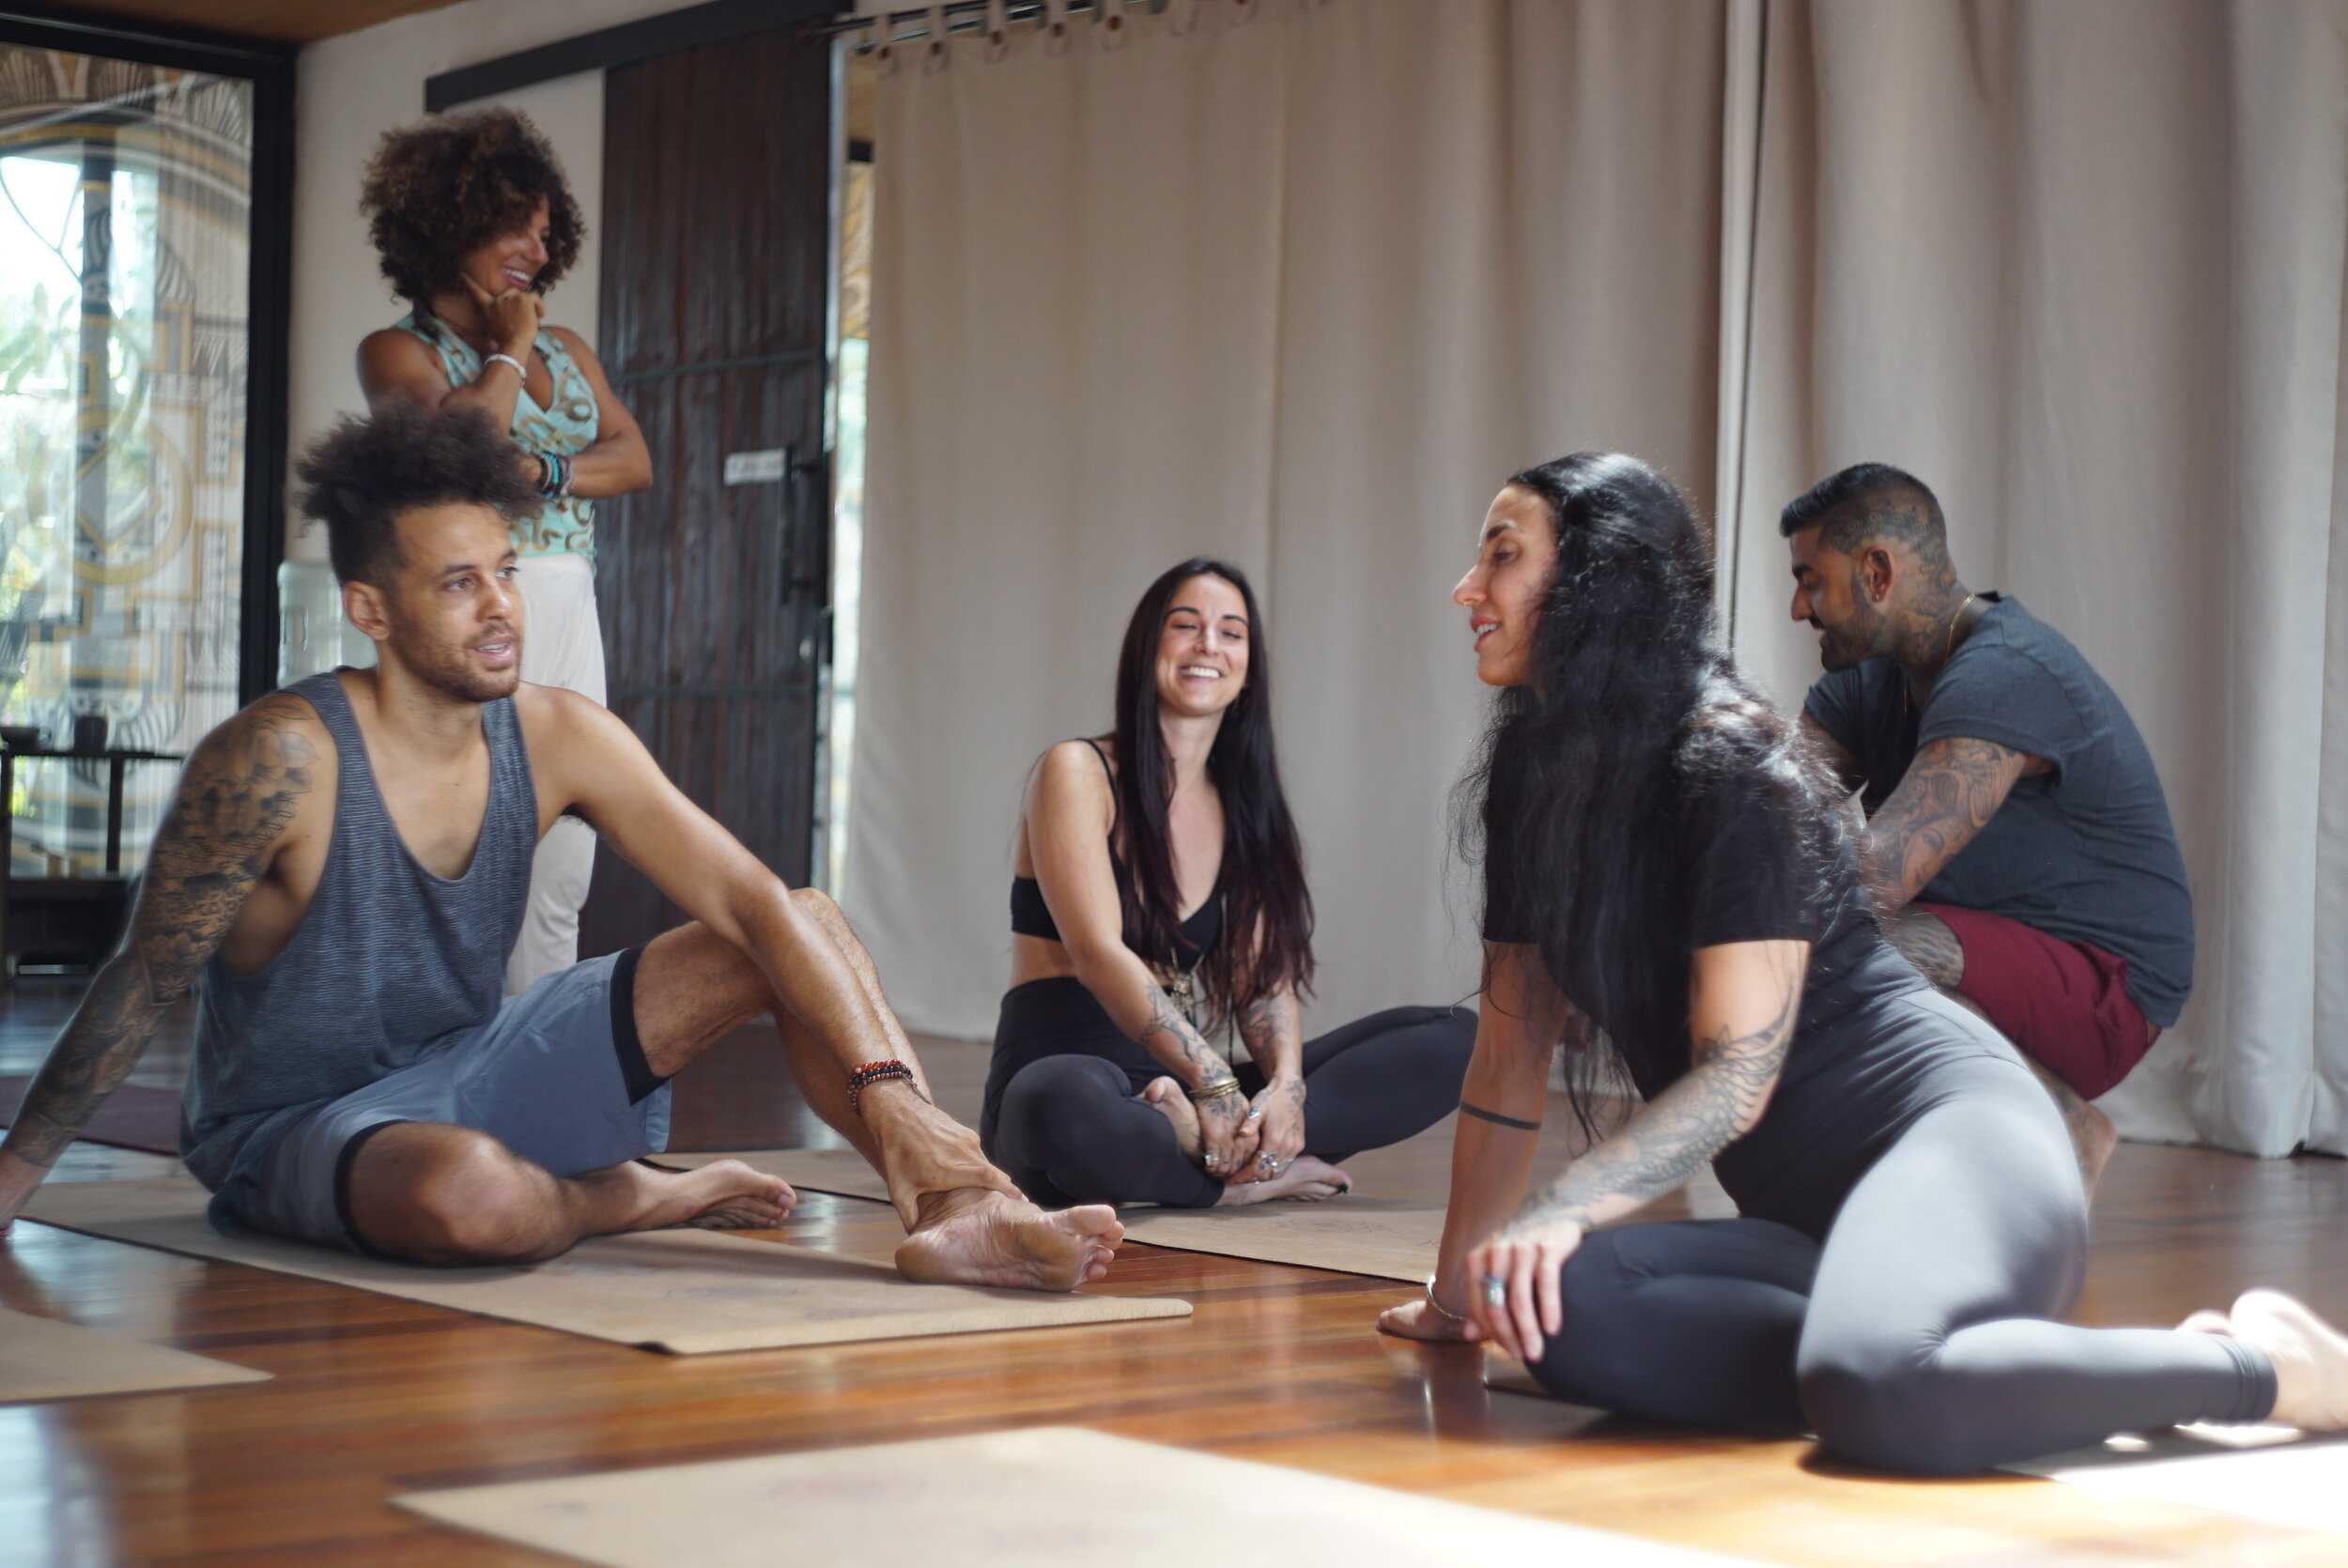 2019_05_04_Karma_House_Yoga_A7sii_181.JPG